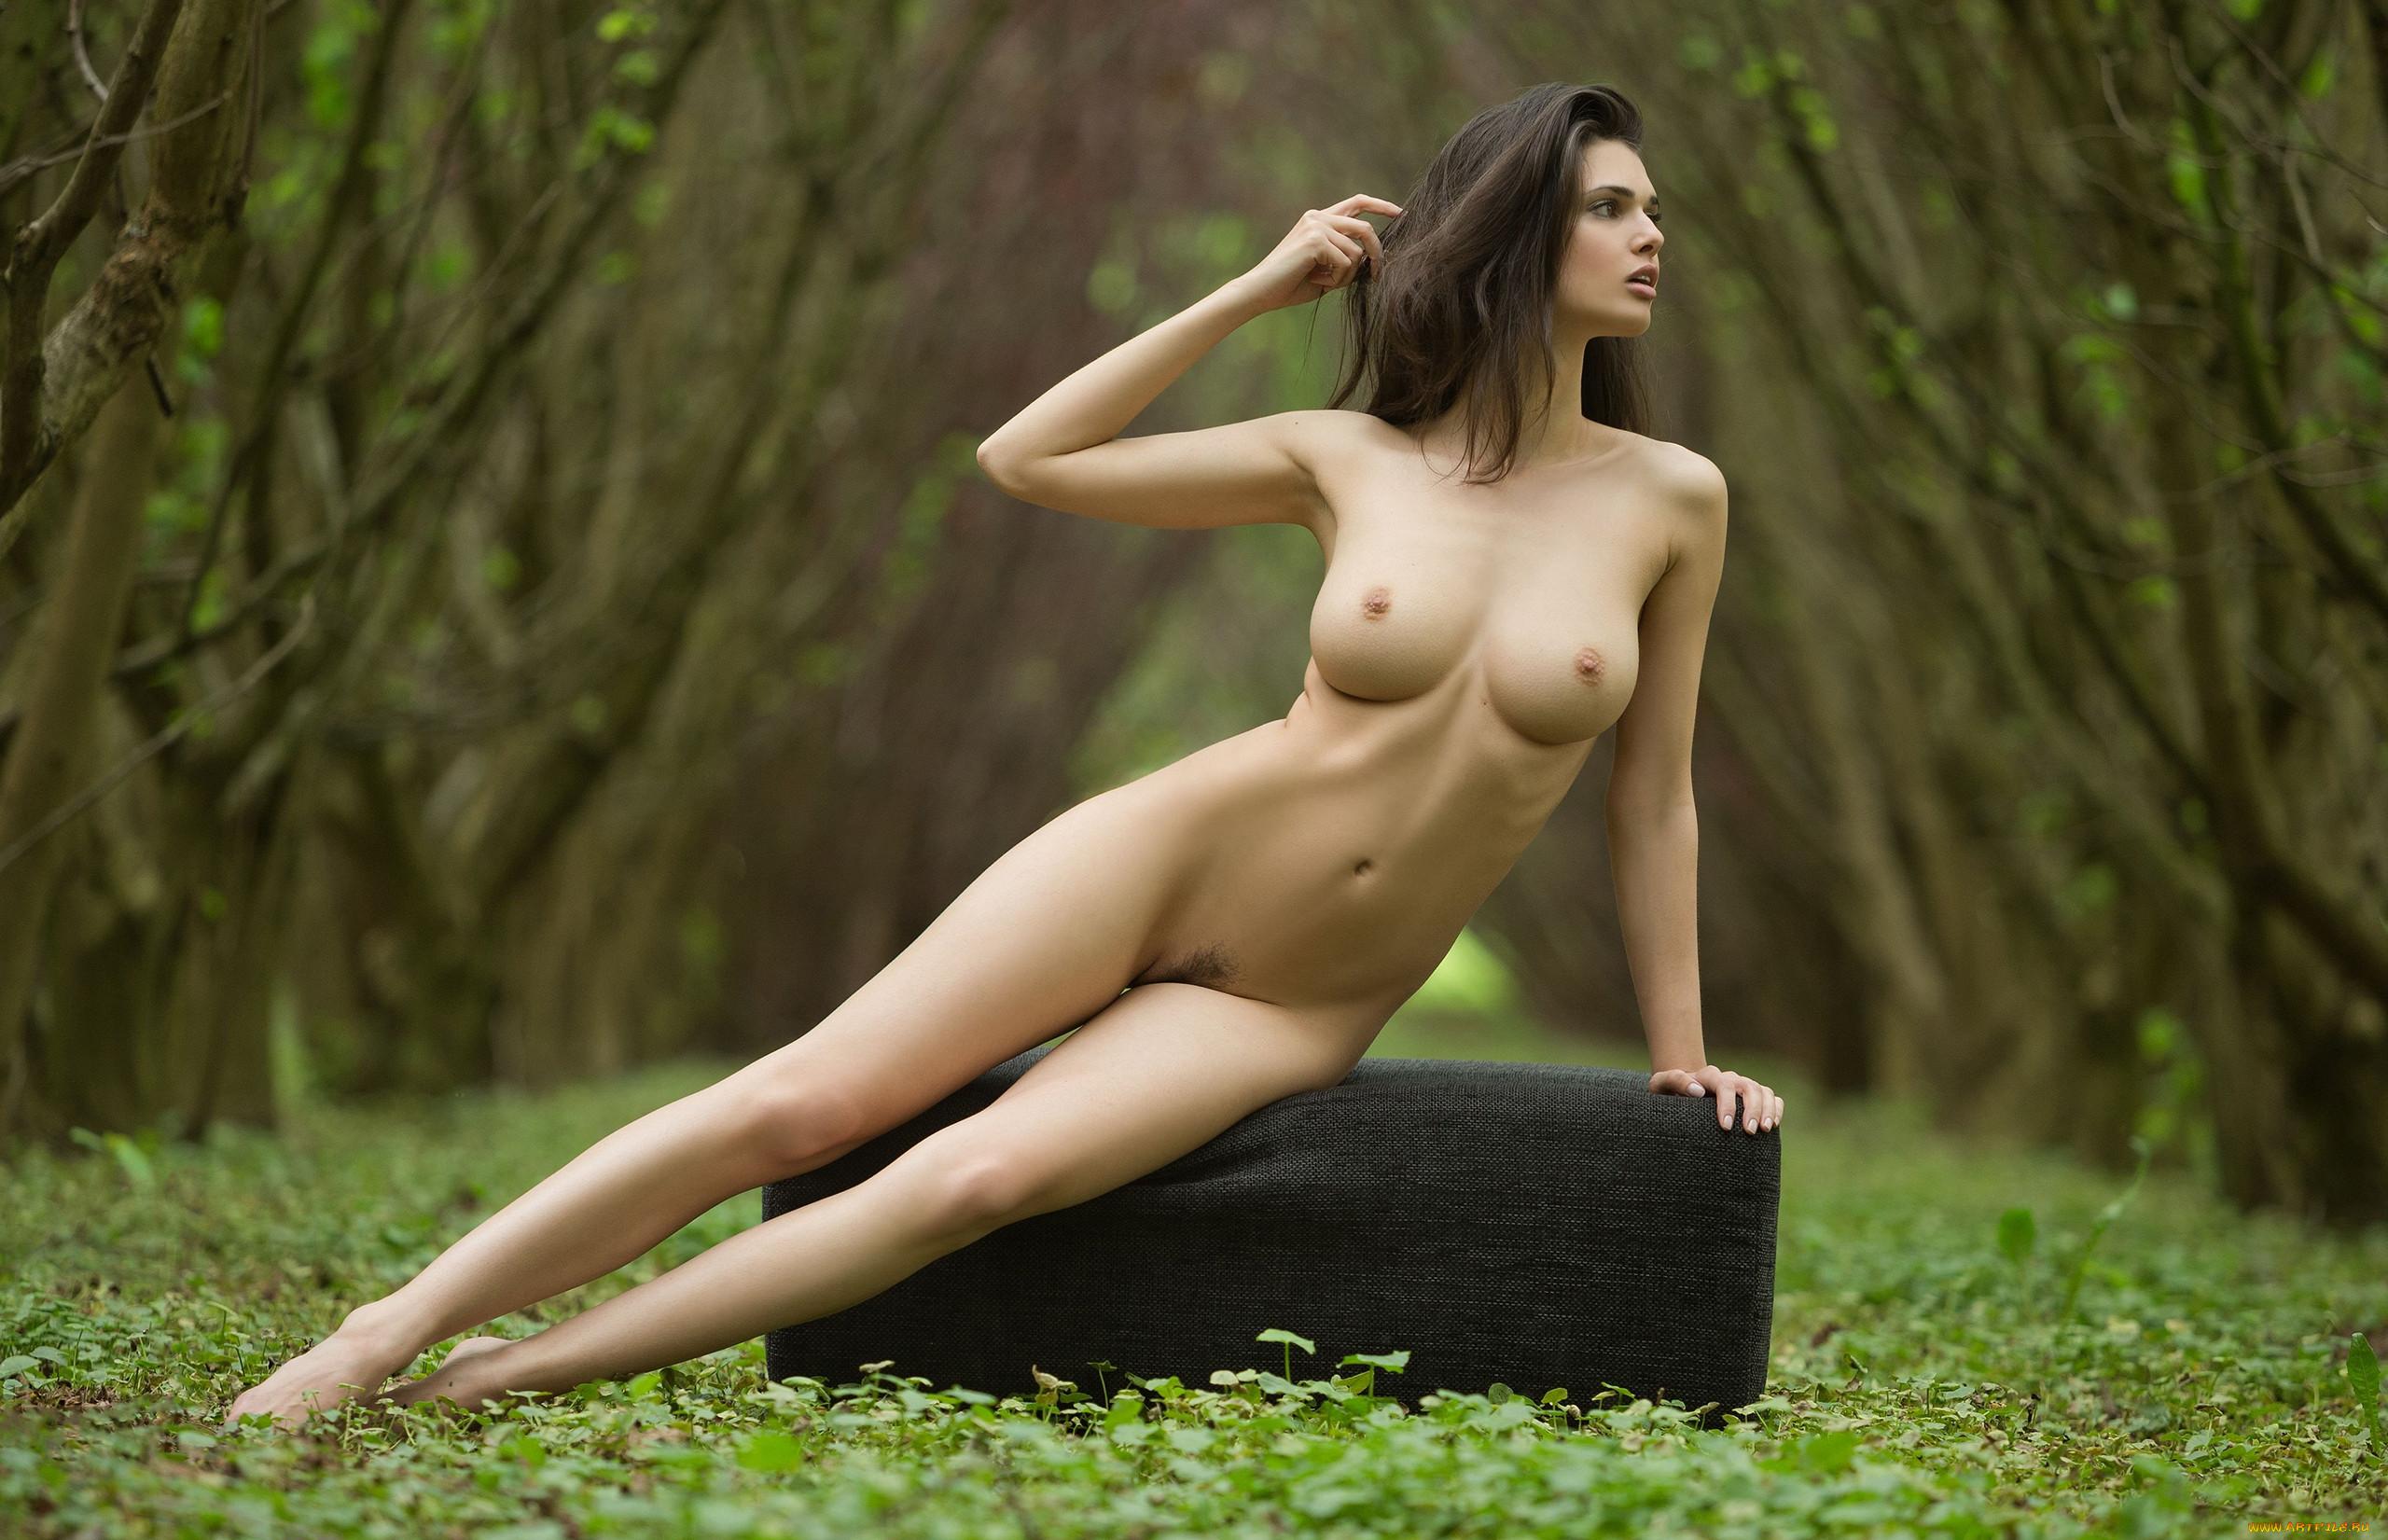 Фото Женщин На Природе Обнаж